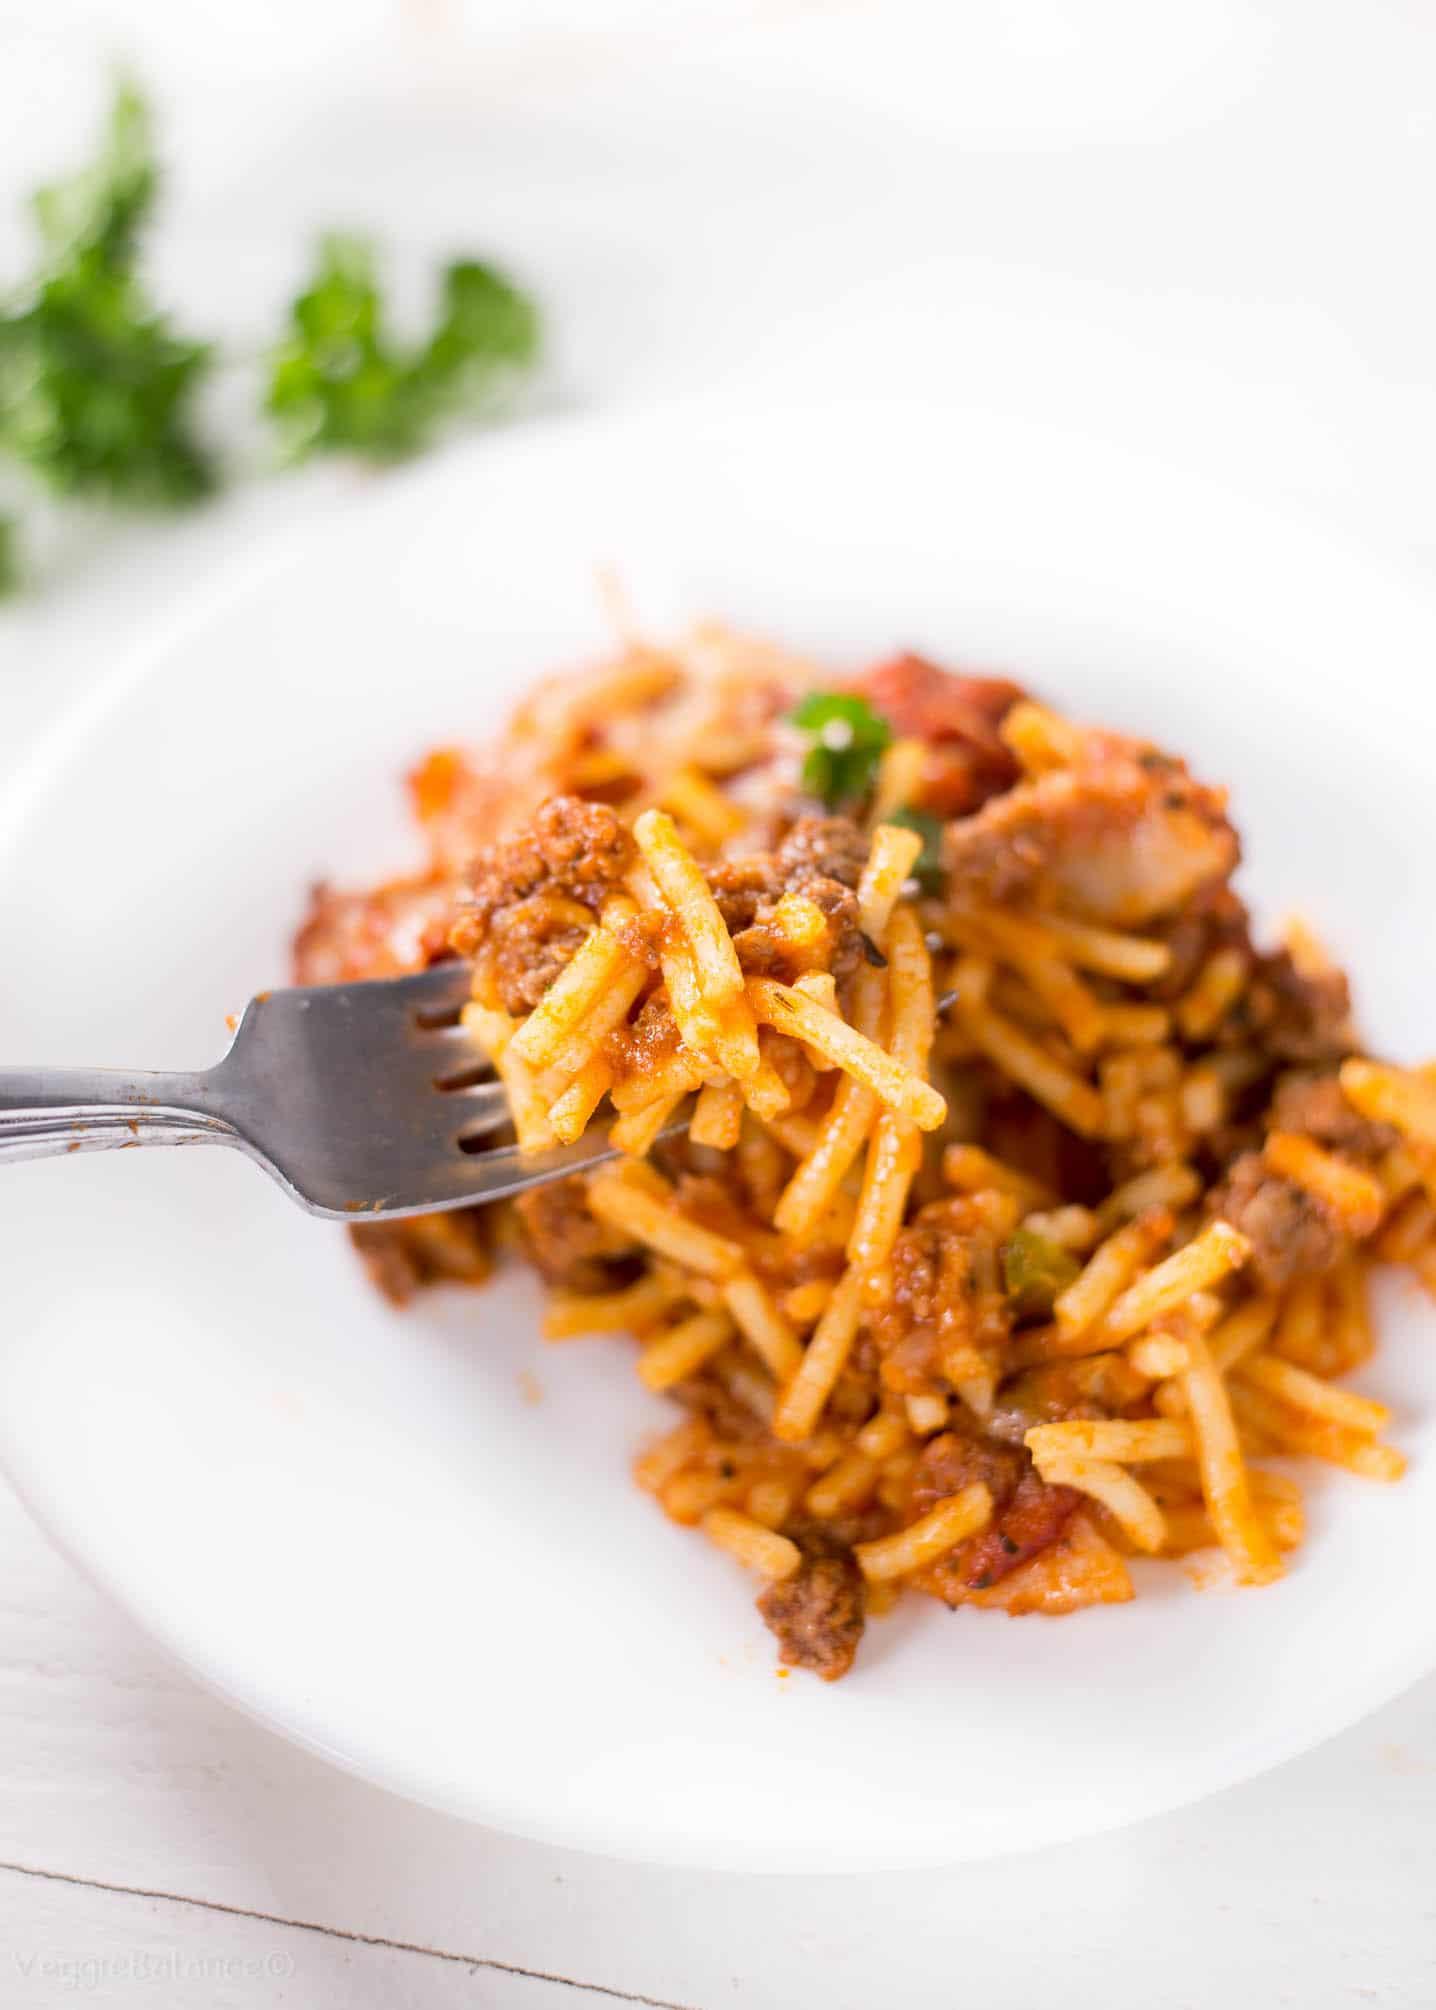 Baked Spaghetti Casserole (Gluten-Free) recipe